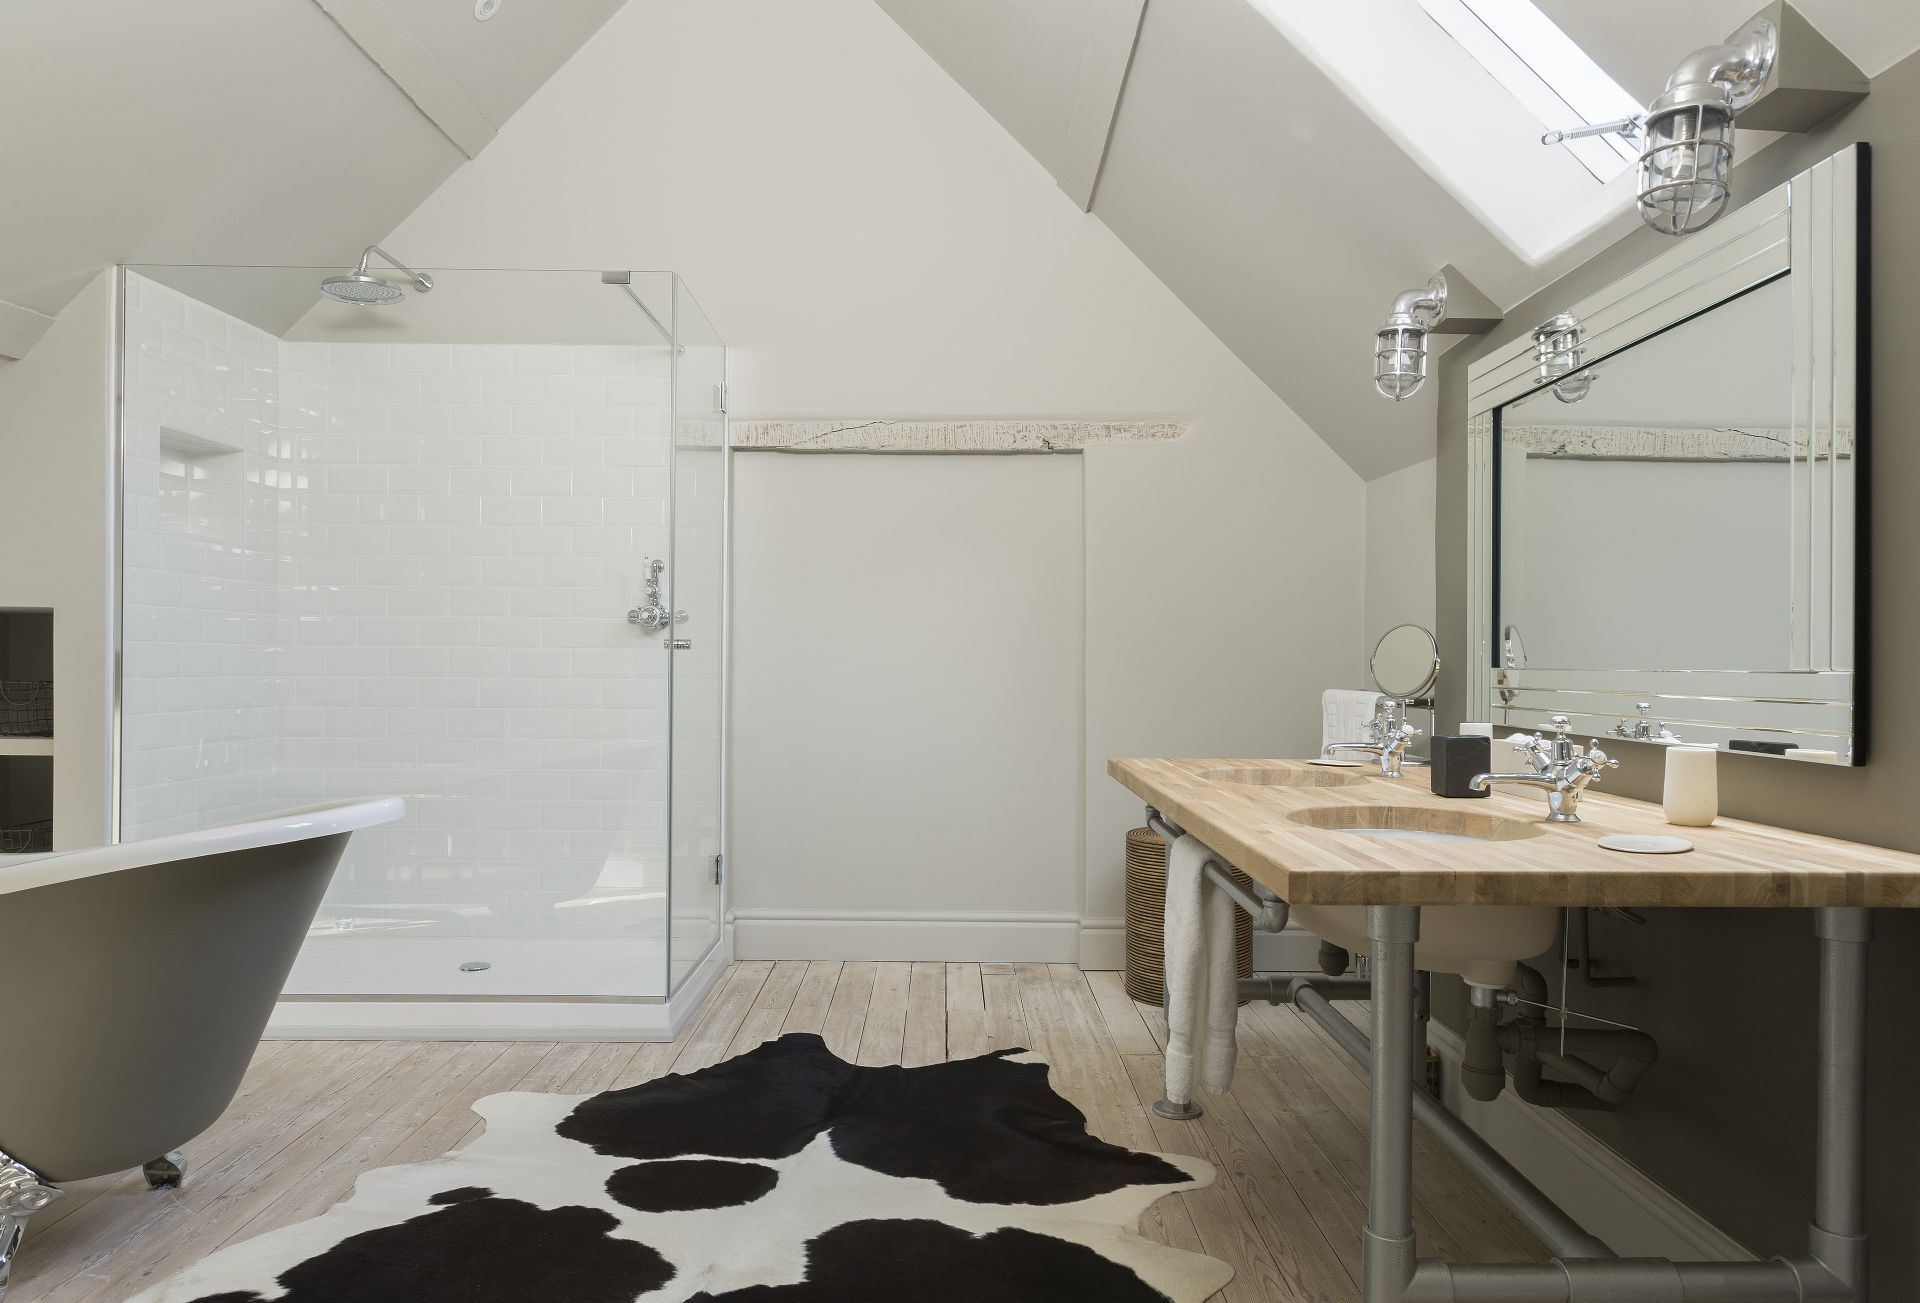 First floor: En-suite bathroom with roll-top bath and walk in shower